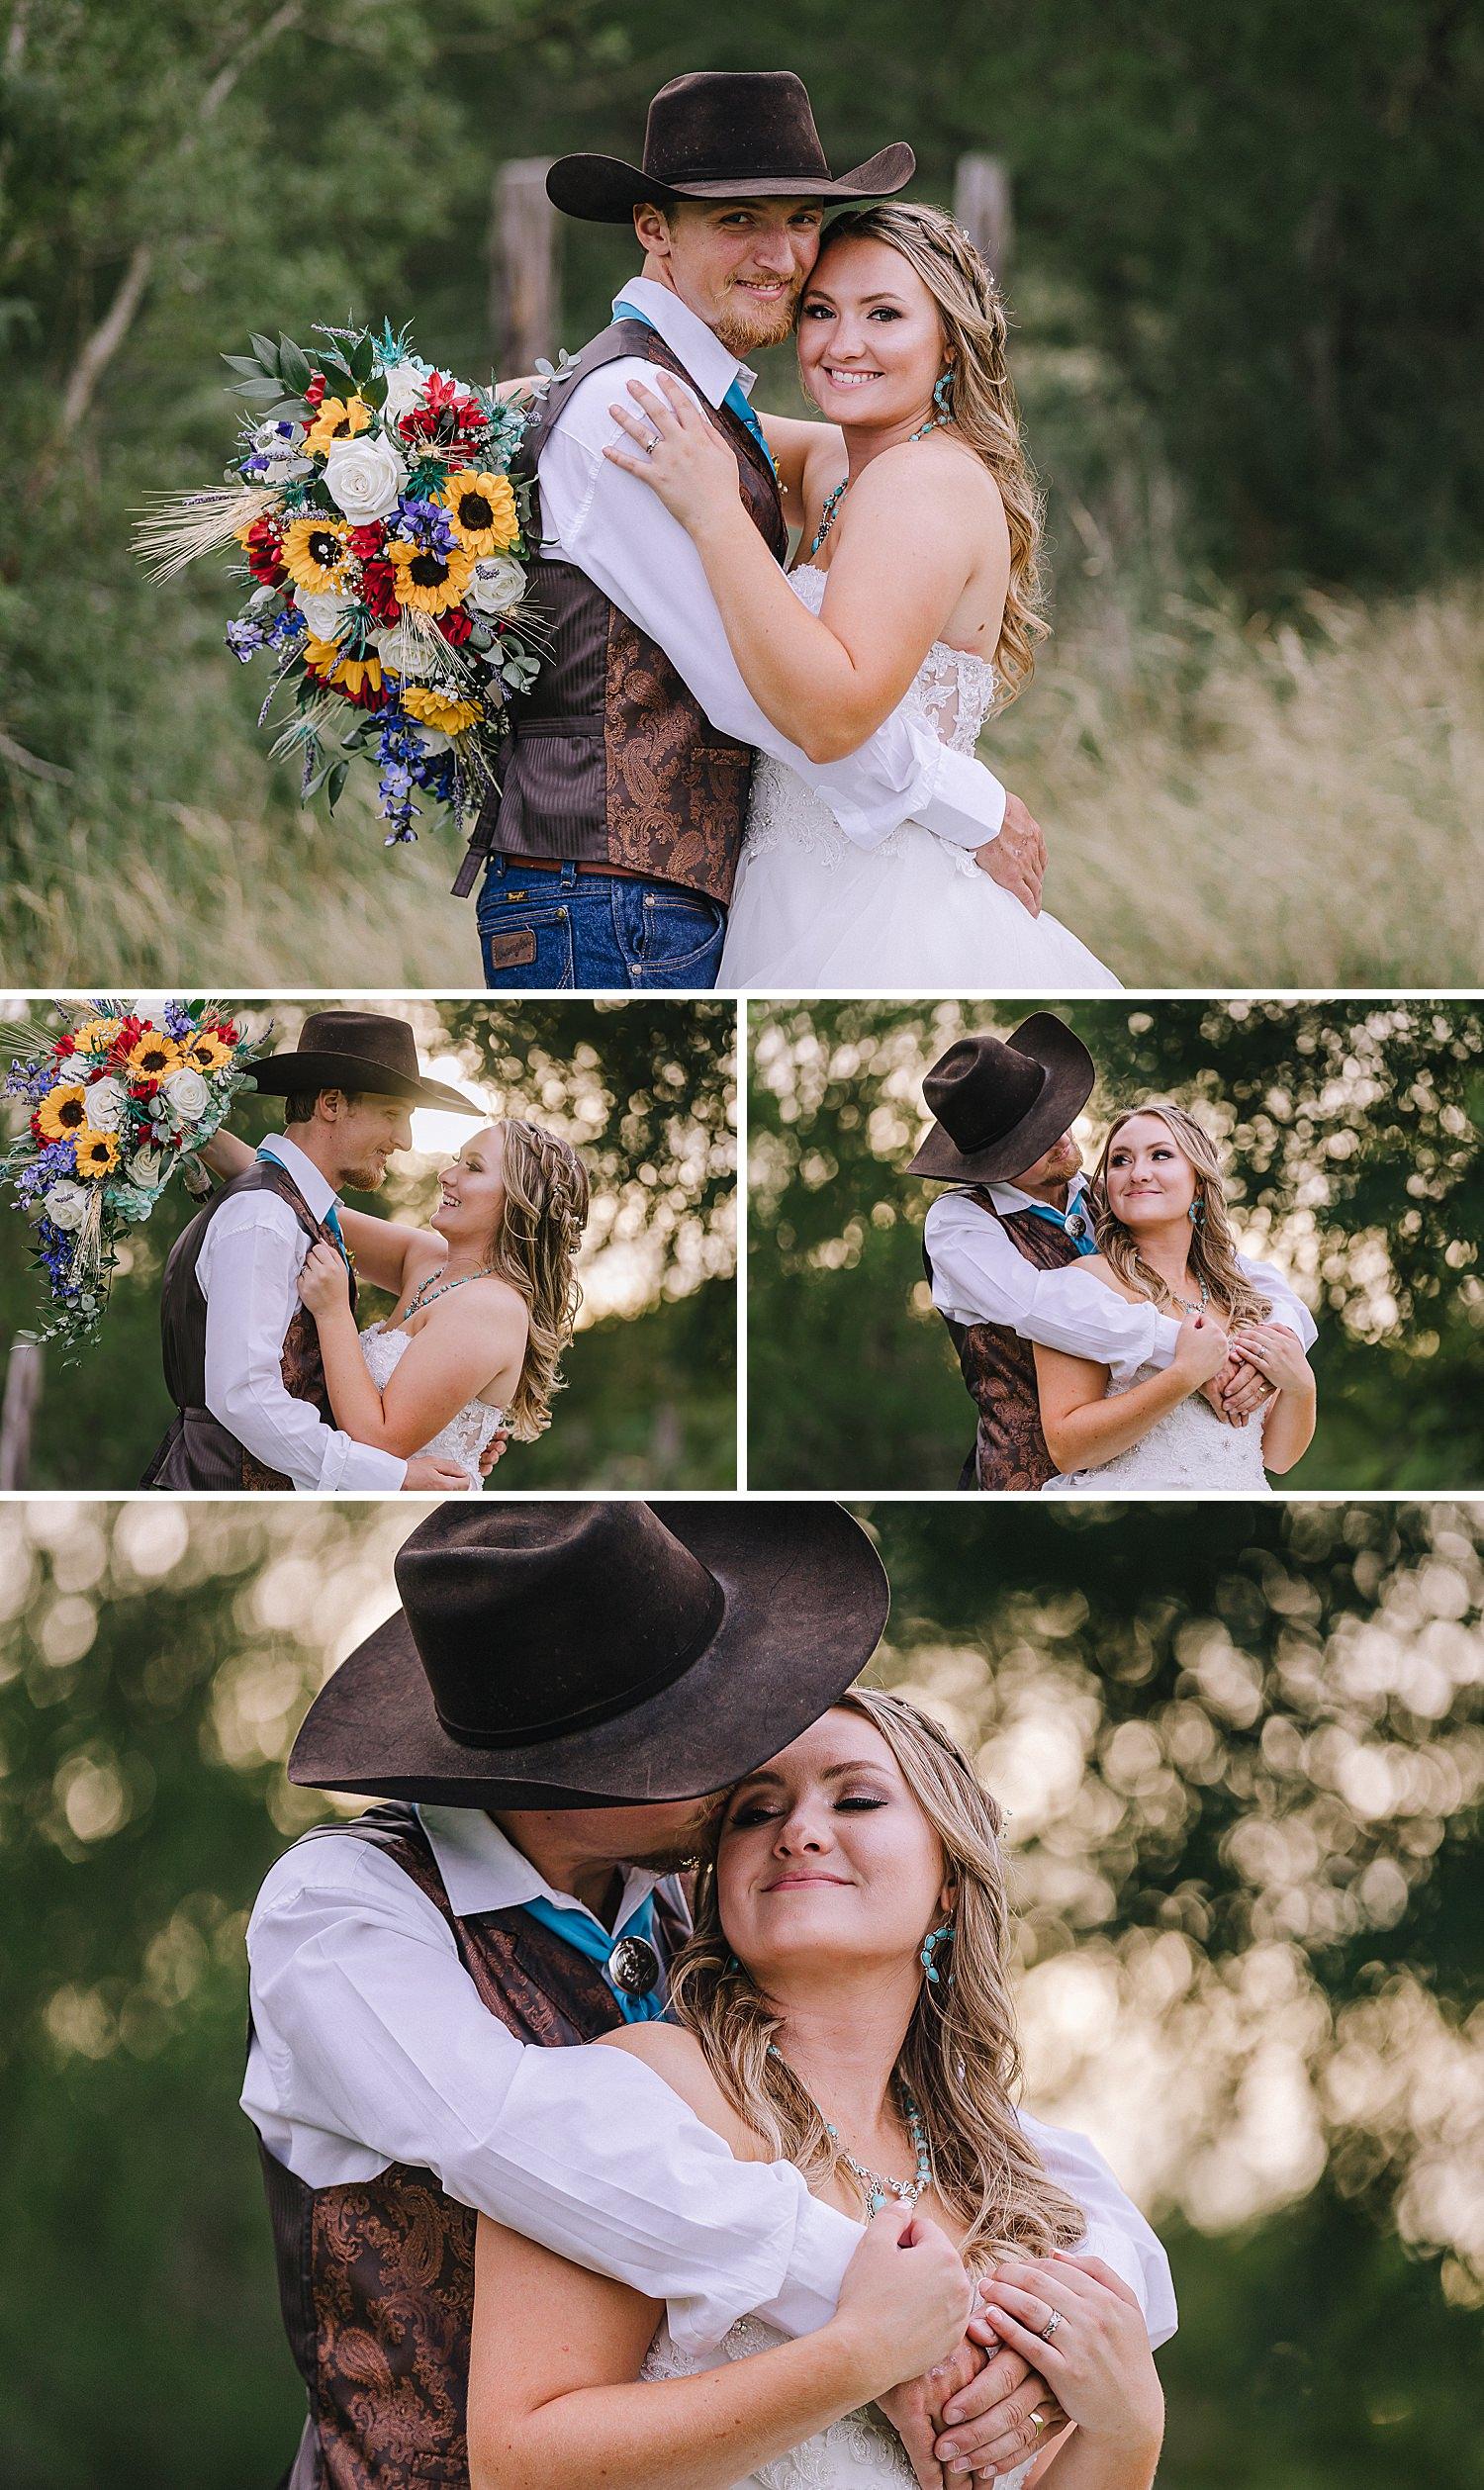 Carly-Barton-Photography-Old-Town-Texas-Rustic-Wedding-Photos-Sunflowers-Boots-Kyle-Texas_0061.jpg